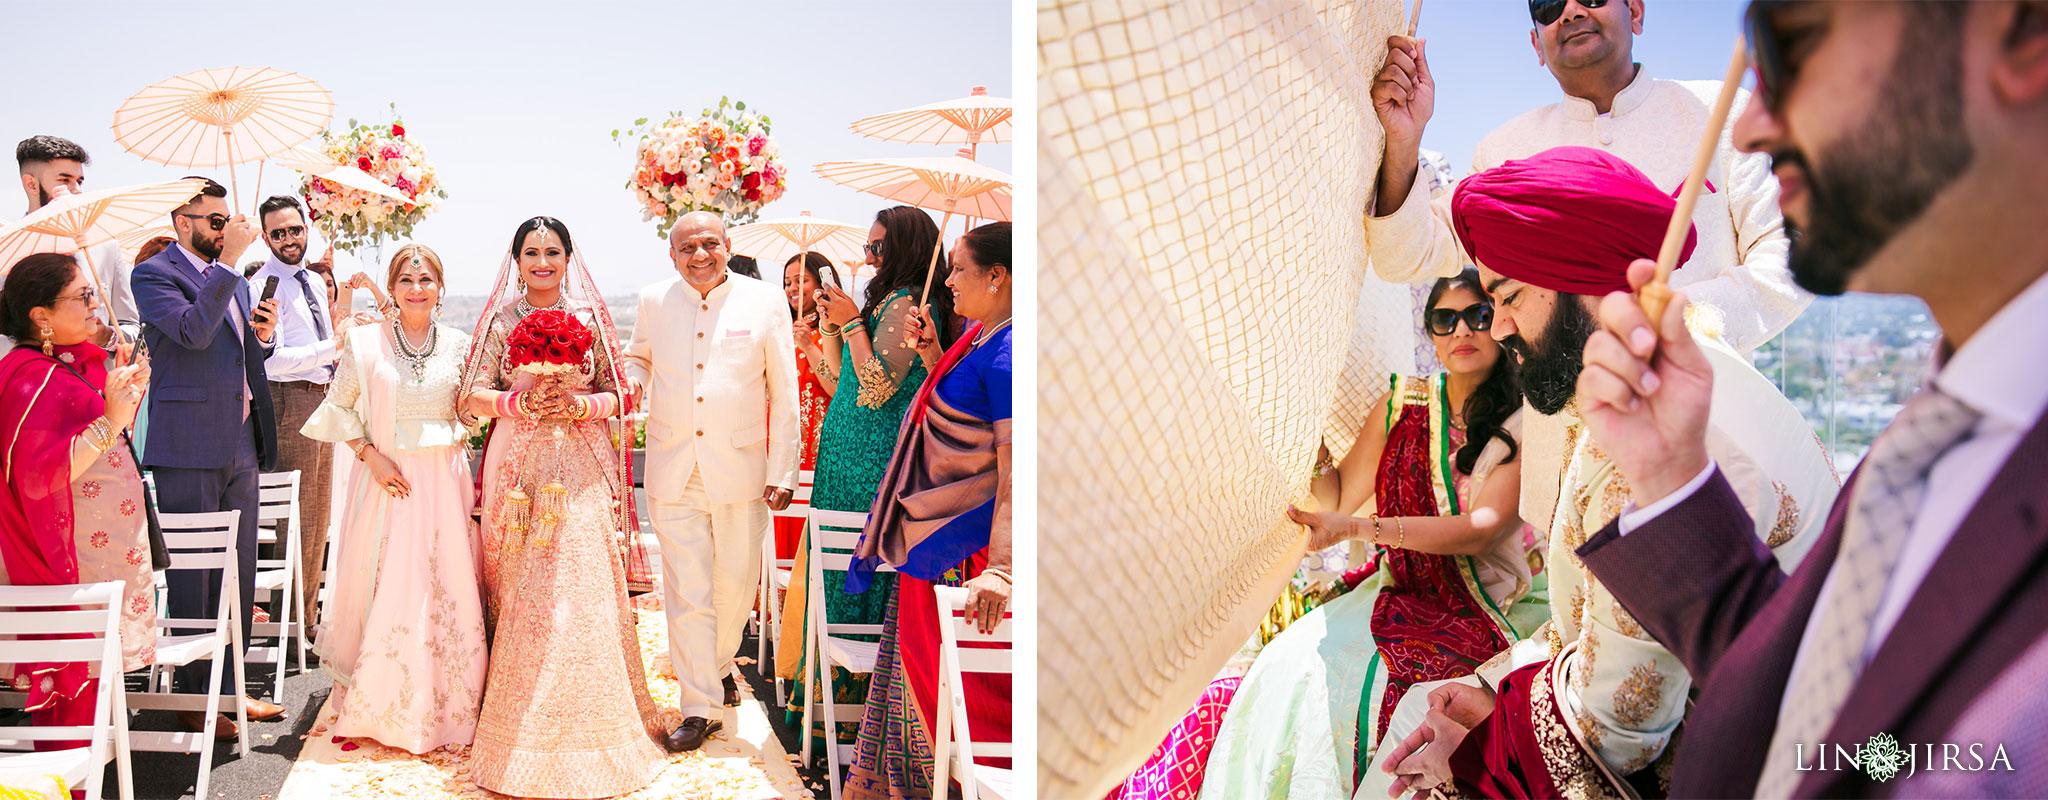 25 marina del rey marriott indian hindu ceremony photography